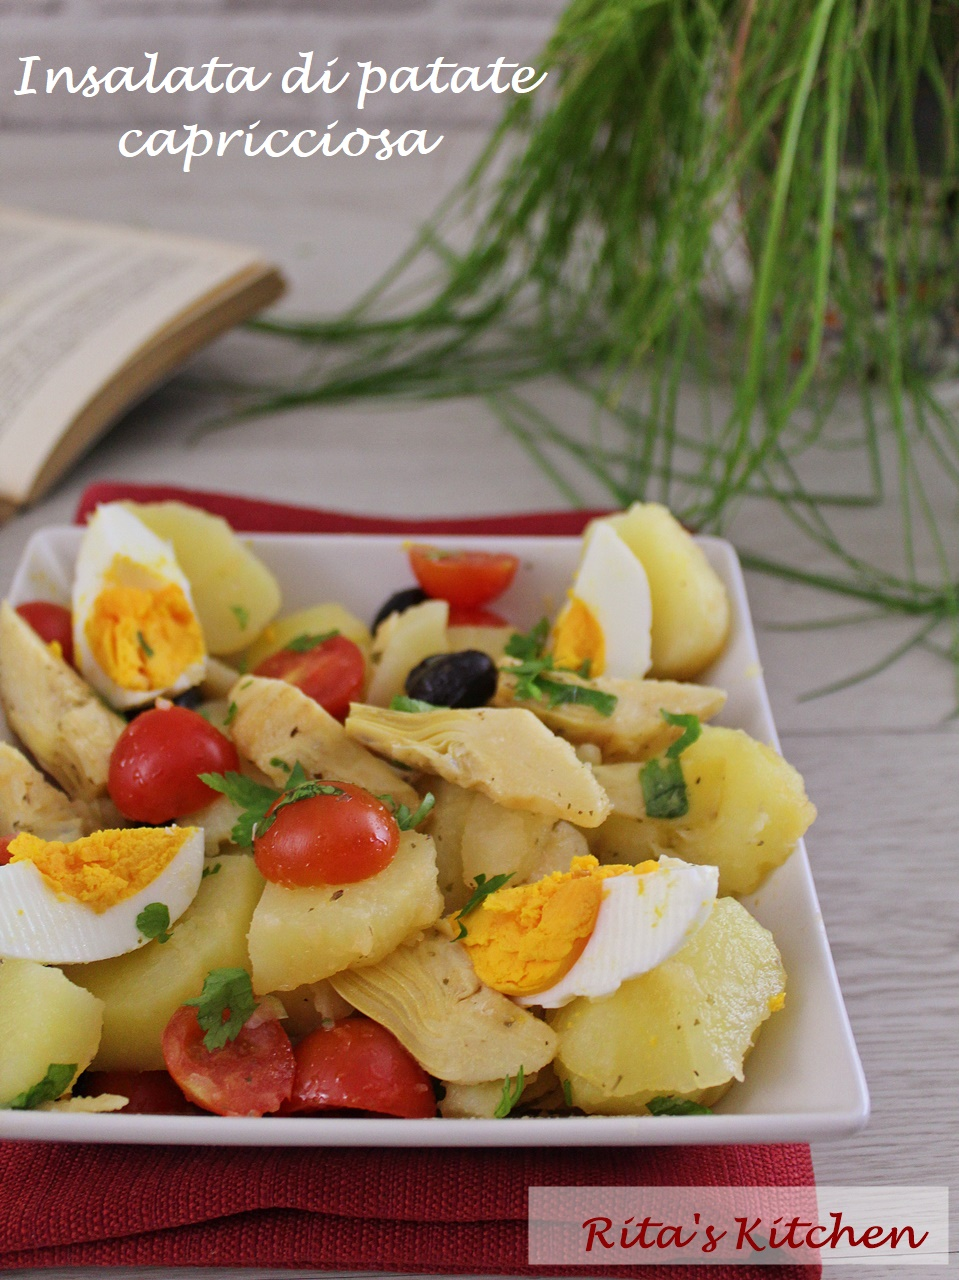 insalata di patate capricciosa